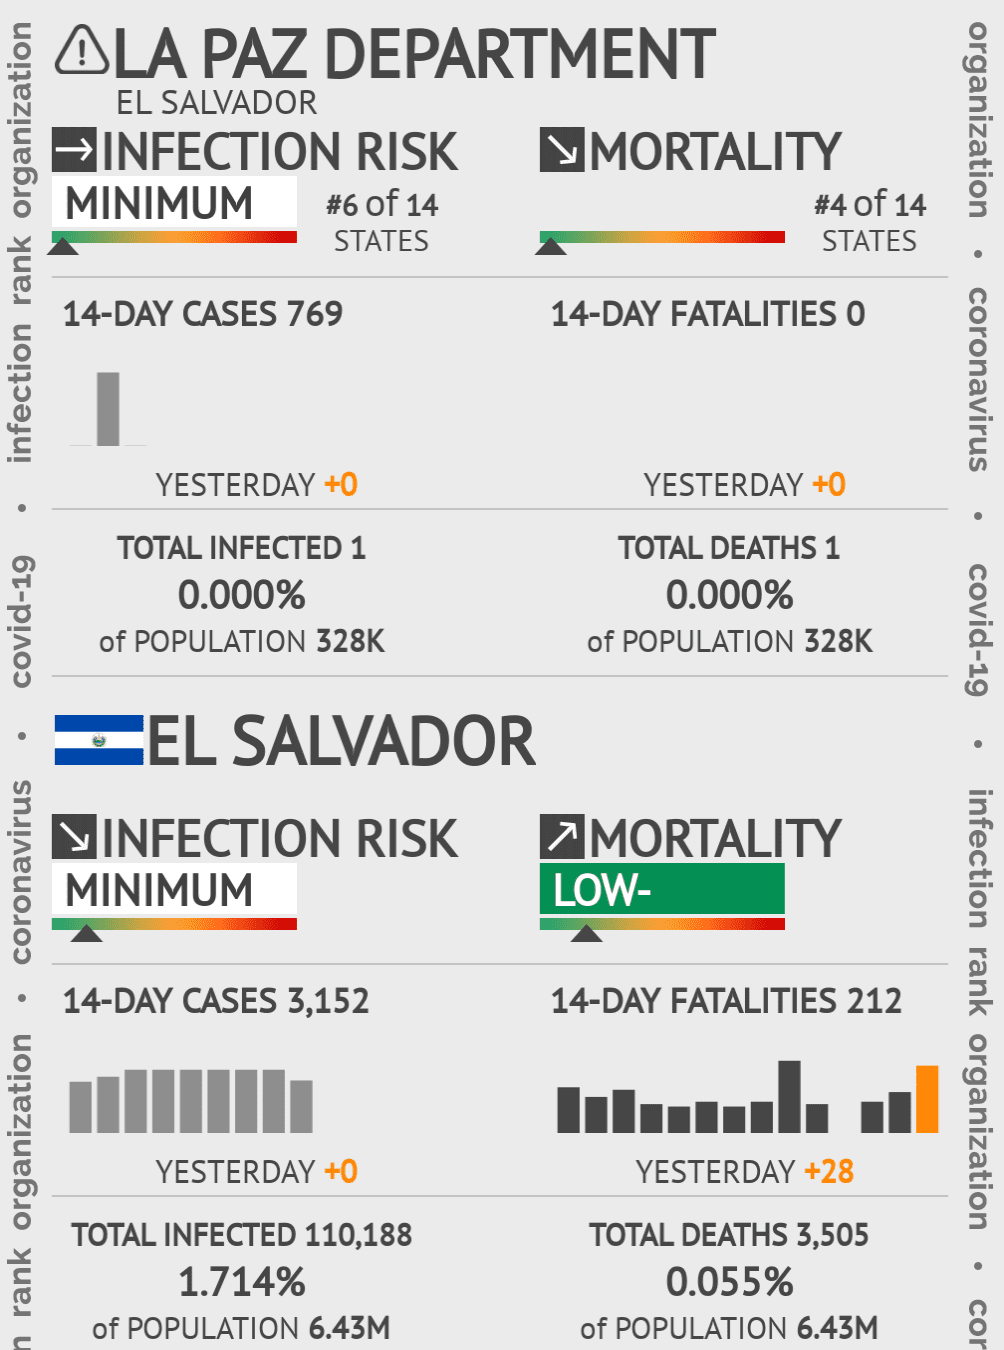 La Paz Coronavirus Covid-19 Risk of Infection on November 11, 2020